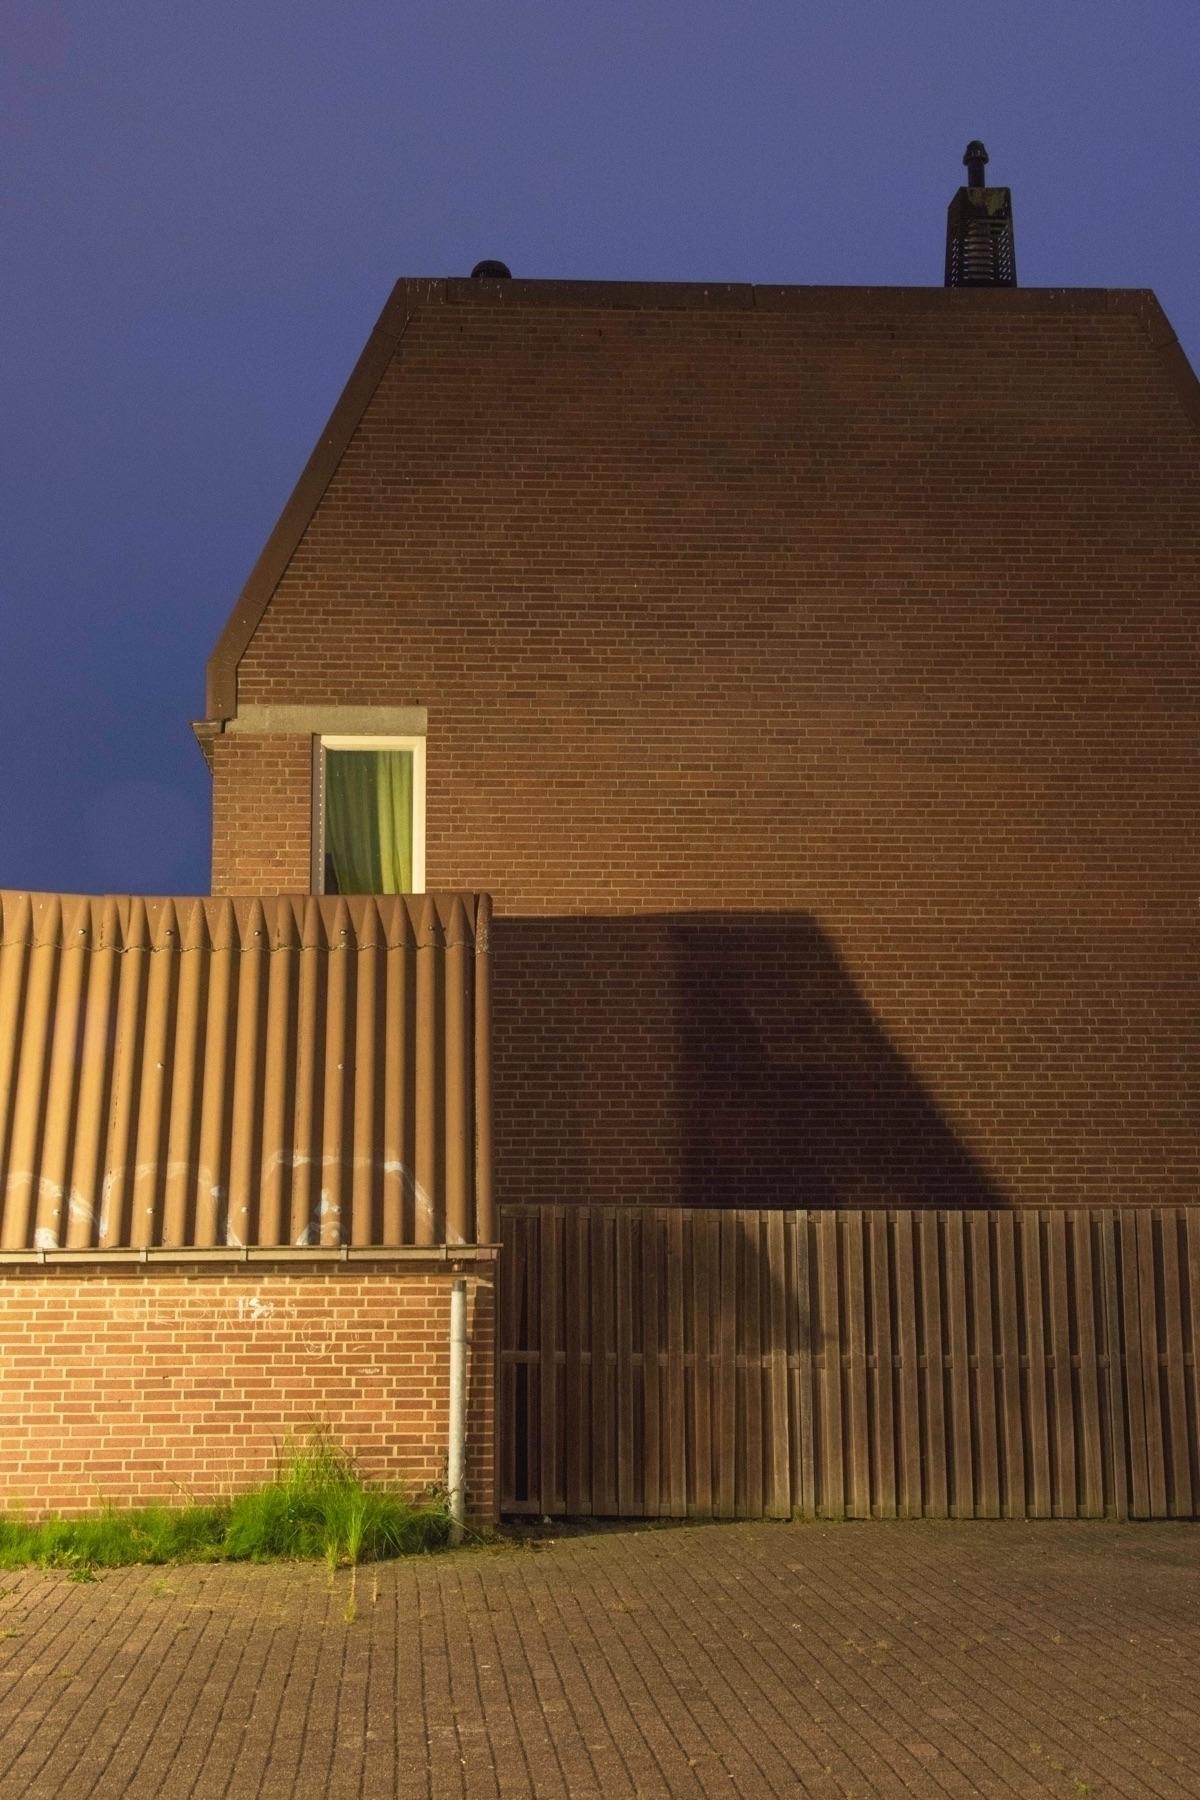 contemporaryphotography, contemporaryart - kristelterbeek | ello